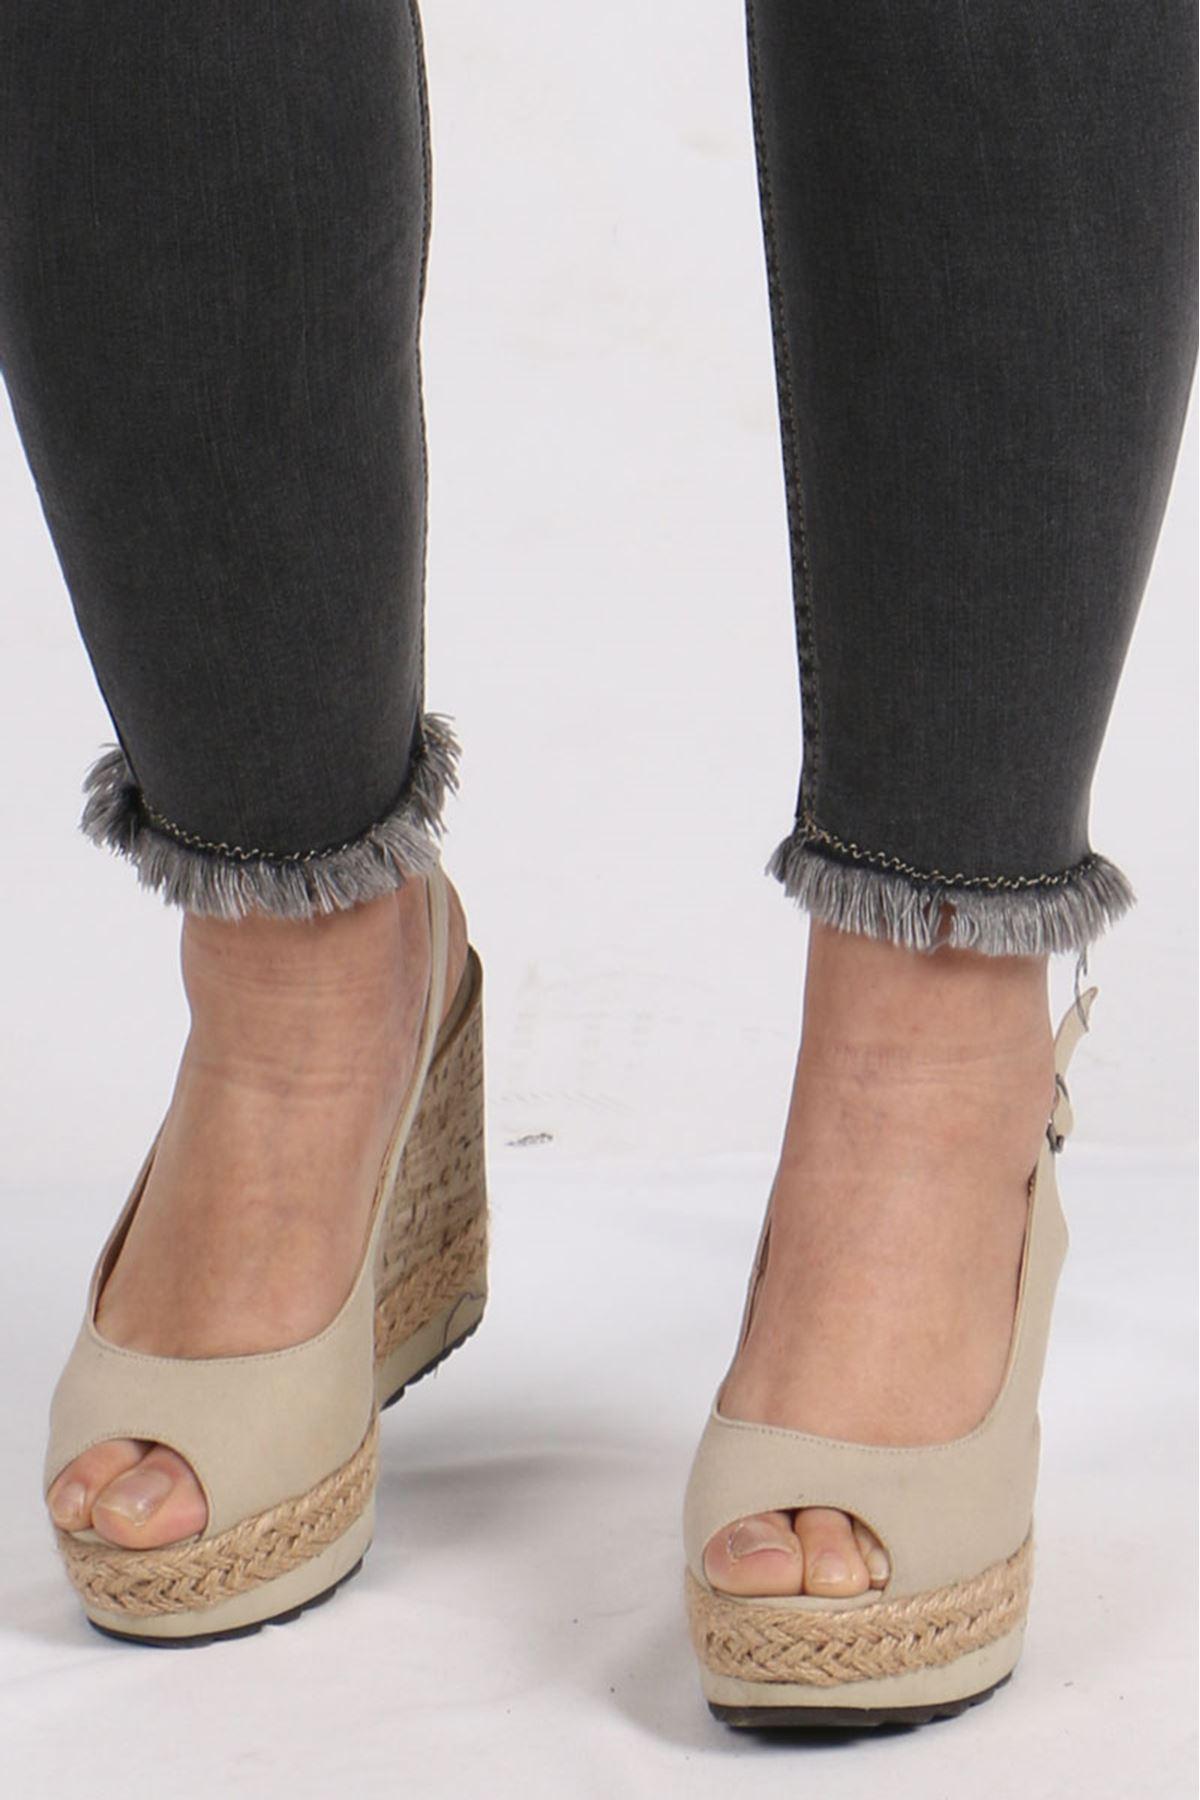 9138 Plus Size Elastic Waist Skinny Leg Jeans - Anthracite